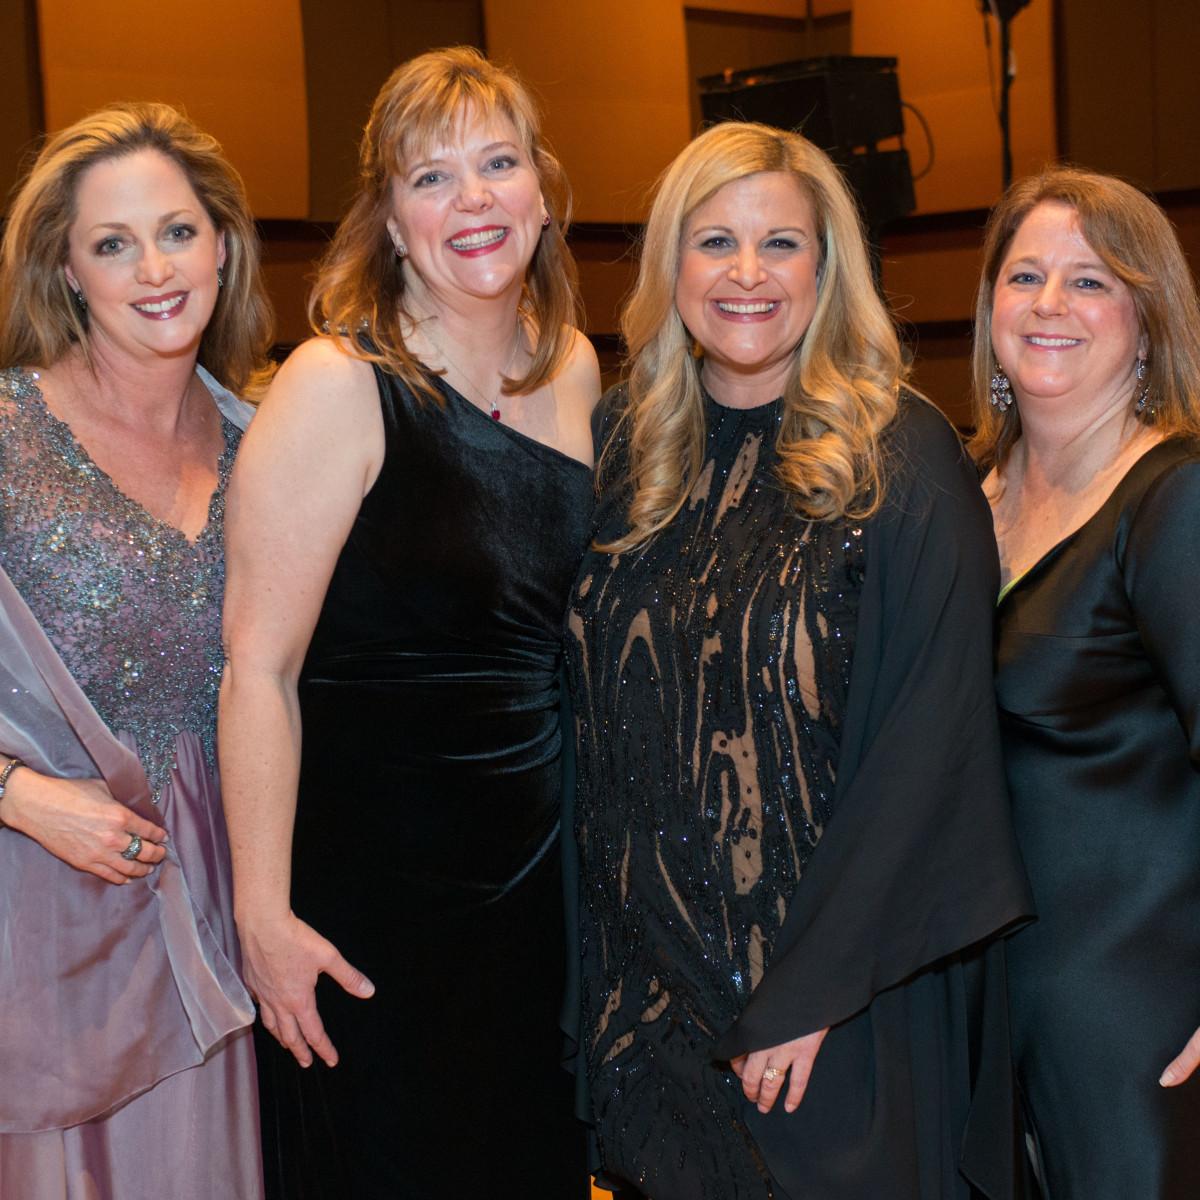 Winter Ball 2016 Kristi Stephens, Kaci Guy, Dee Dee Marsh, Shelley Ludwick